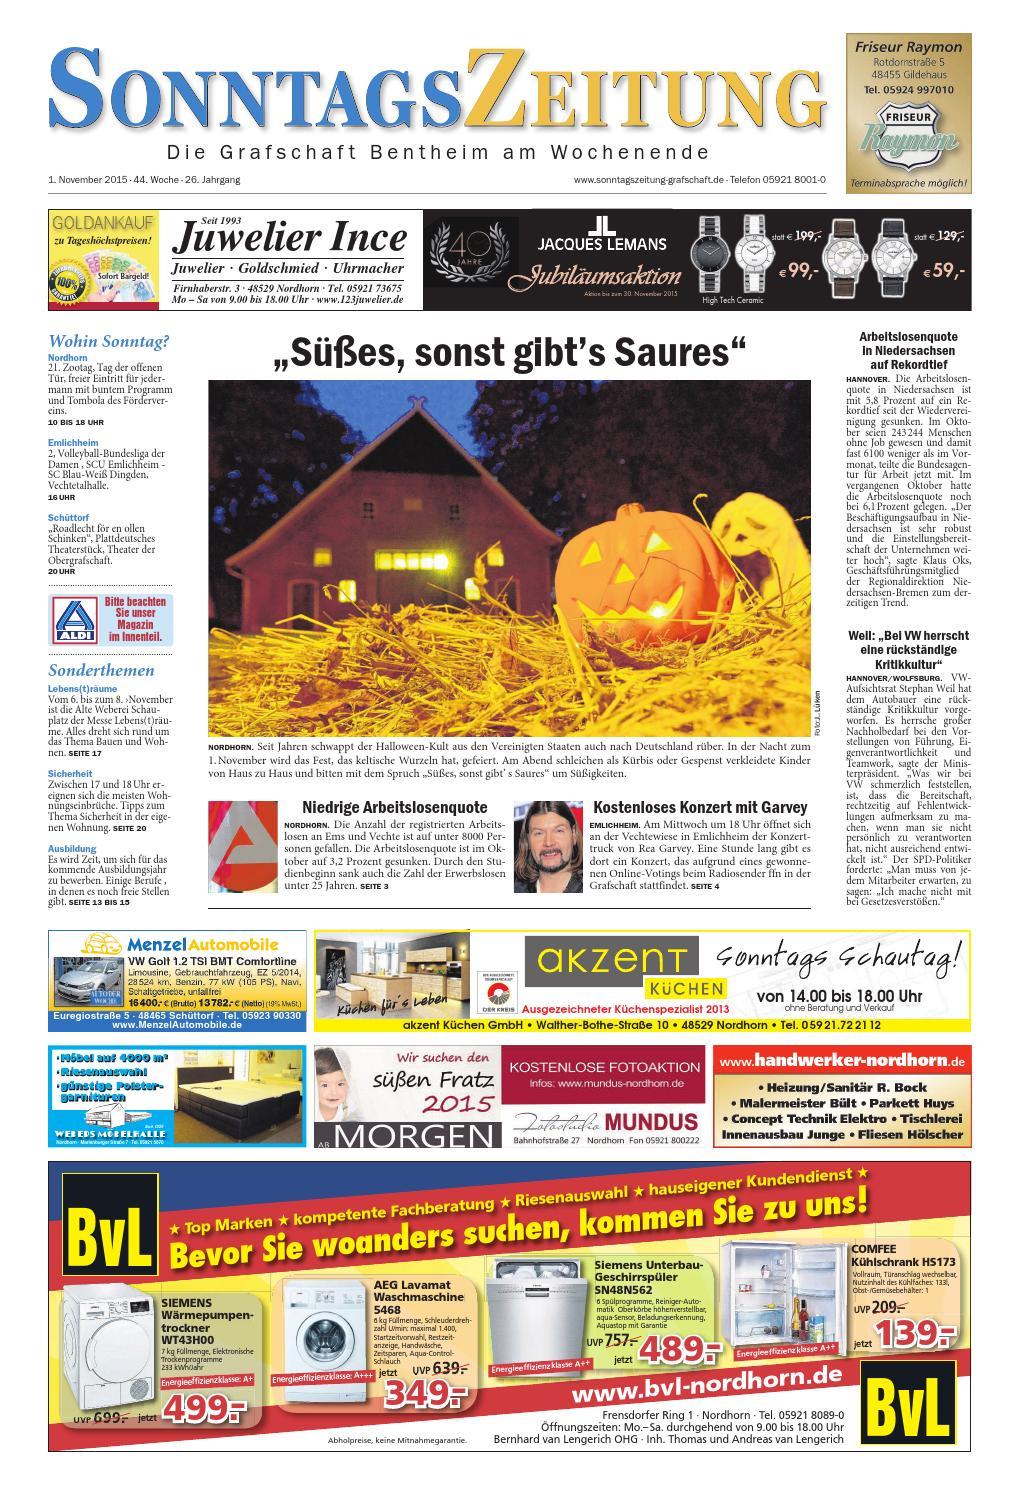 Sonntagszeitung_1.11.2015 by SonntagsZeitung - issuu